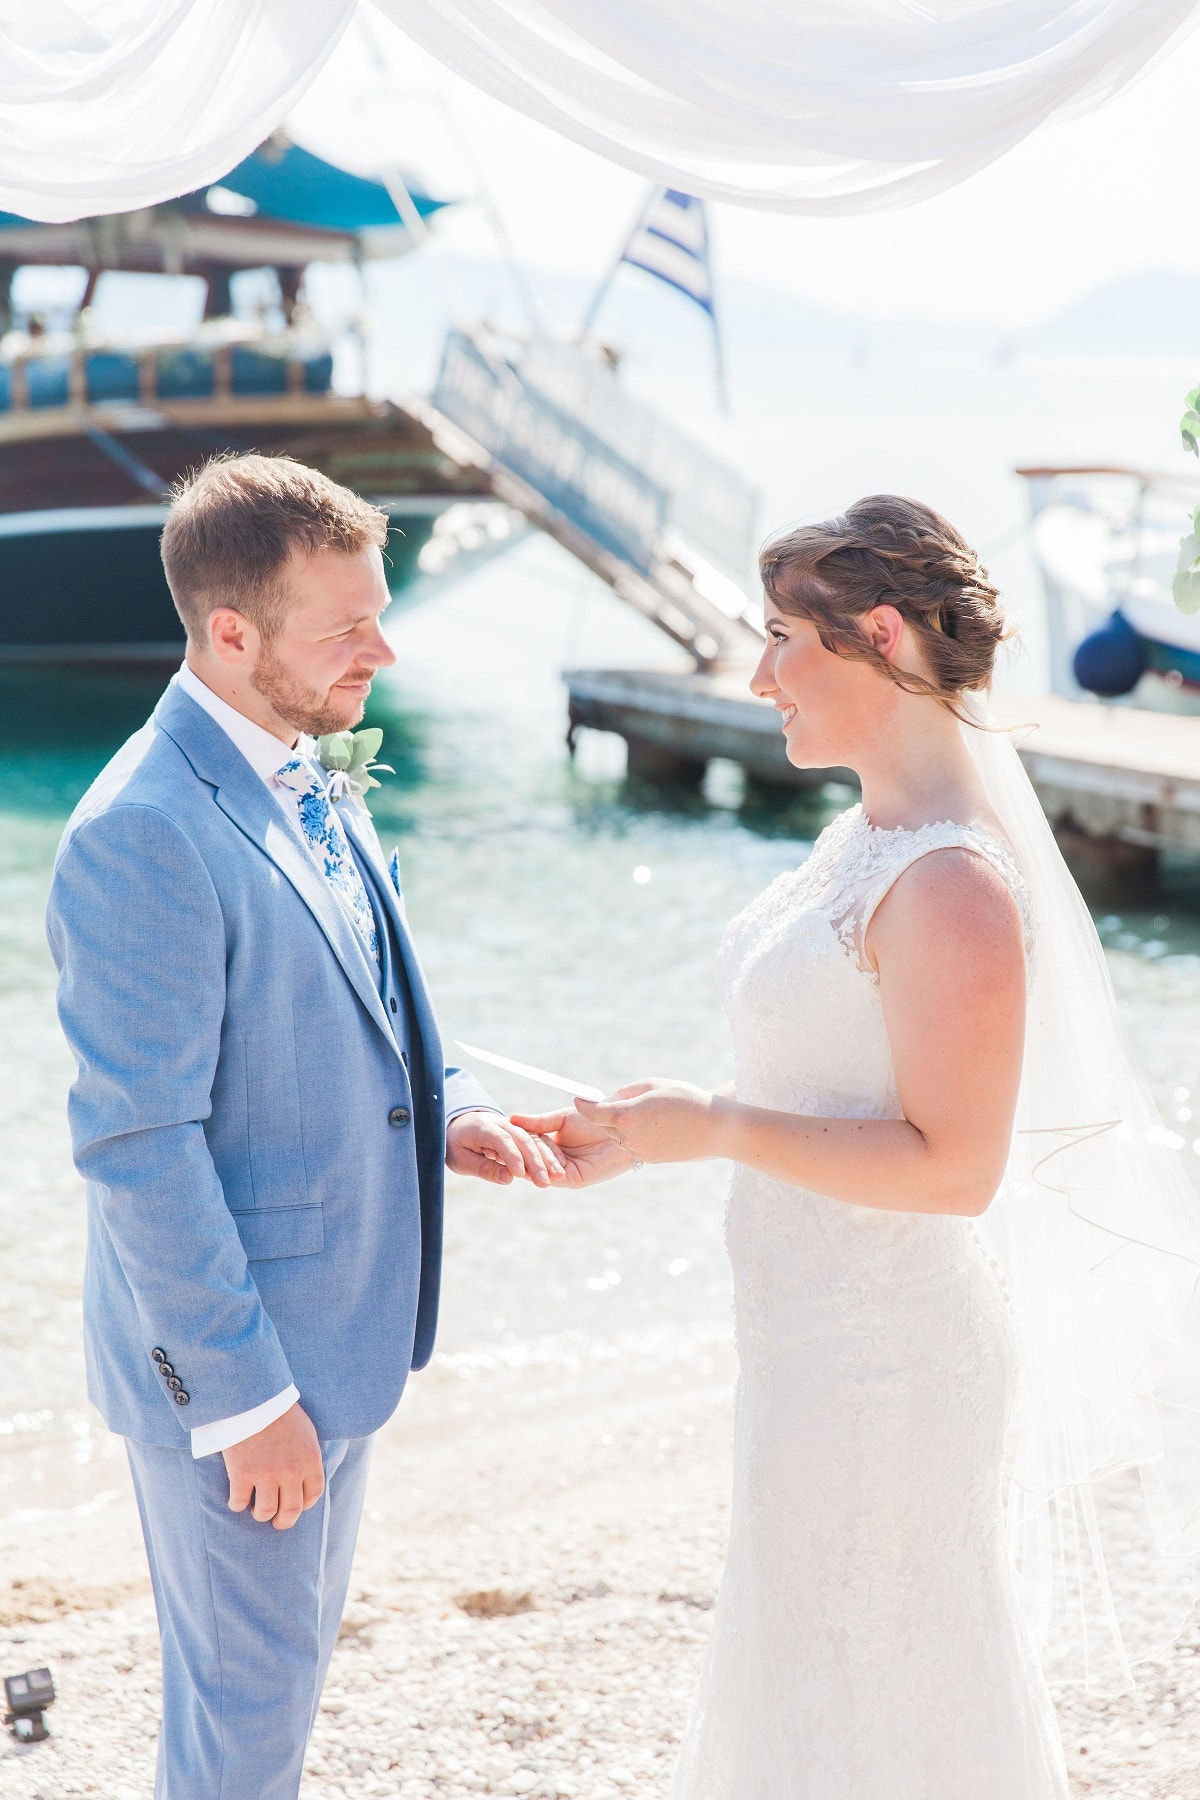 Beach Wedding Ceremony Lefkas Greece - Greek Wedding Abroad | Planned by Lefkas Weddings | Maxeen Kim Photography